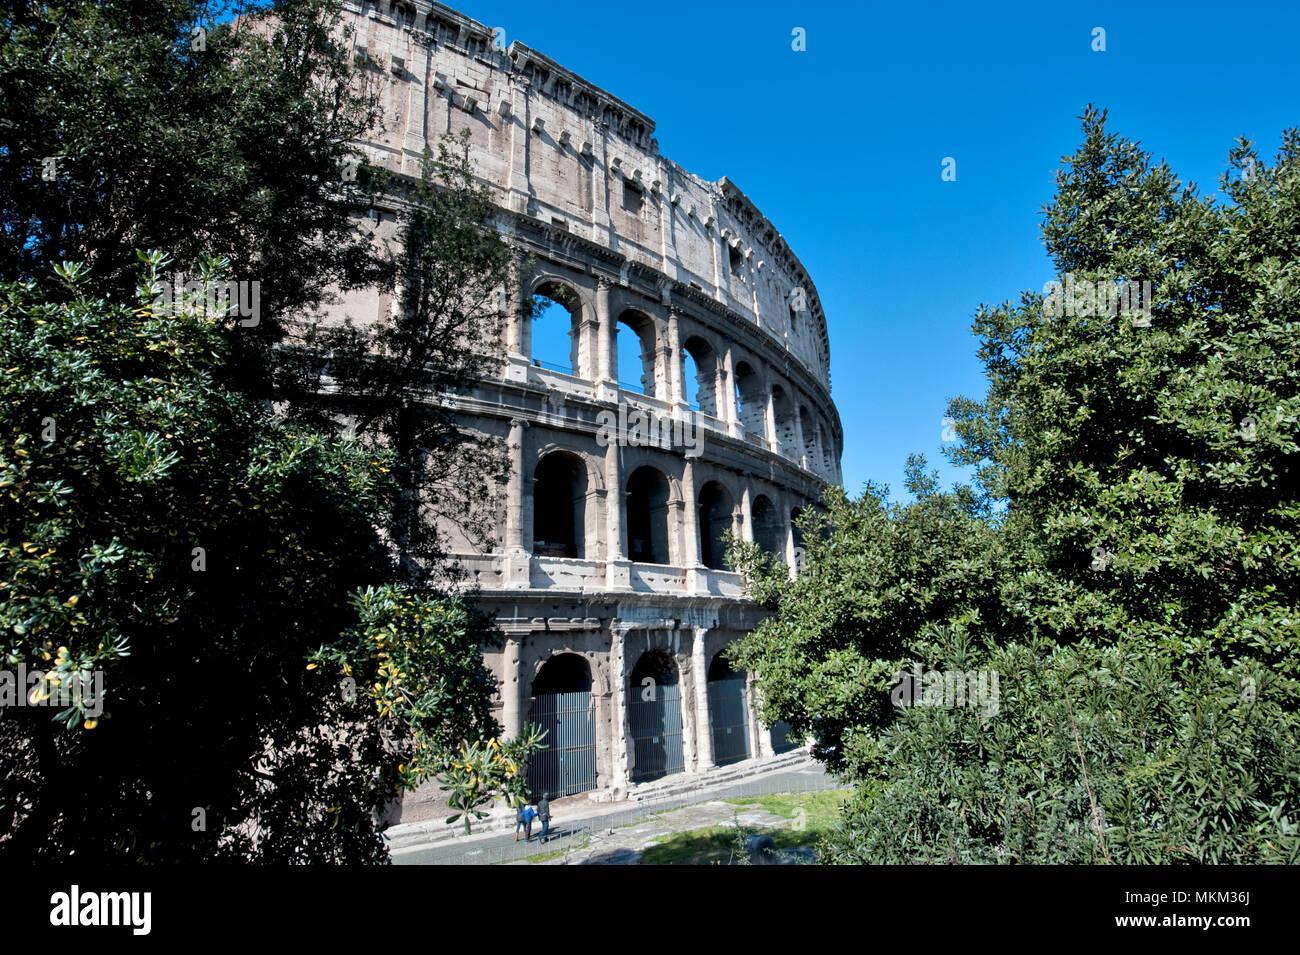 Outside view of Colosseum / Rome   Außenansicht von Kolosseum / Rom - Stock Image